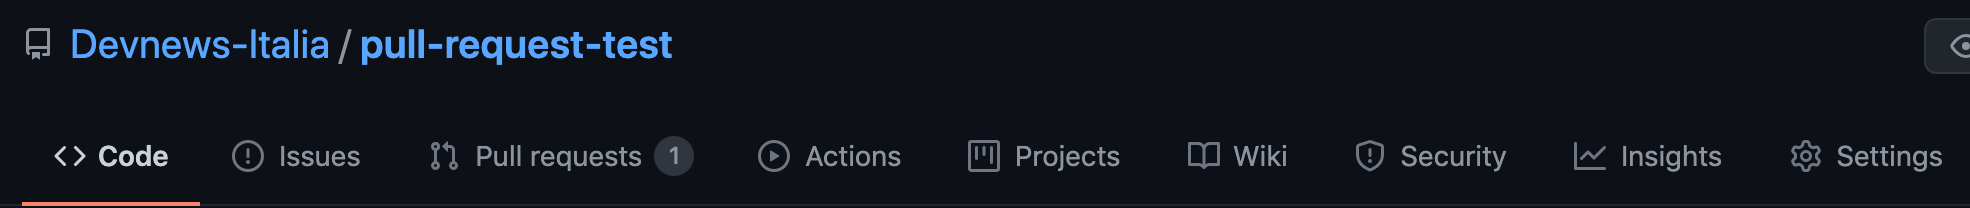 pull request elenco github